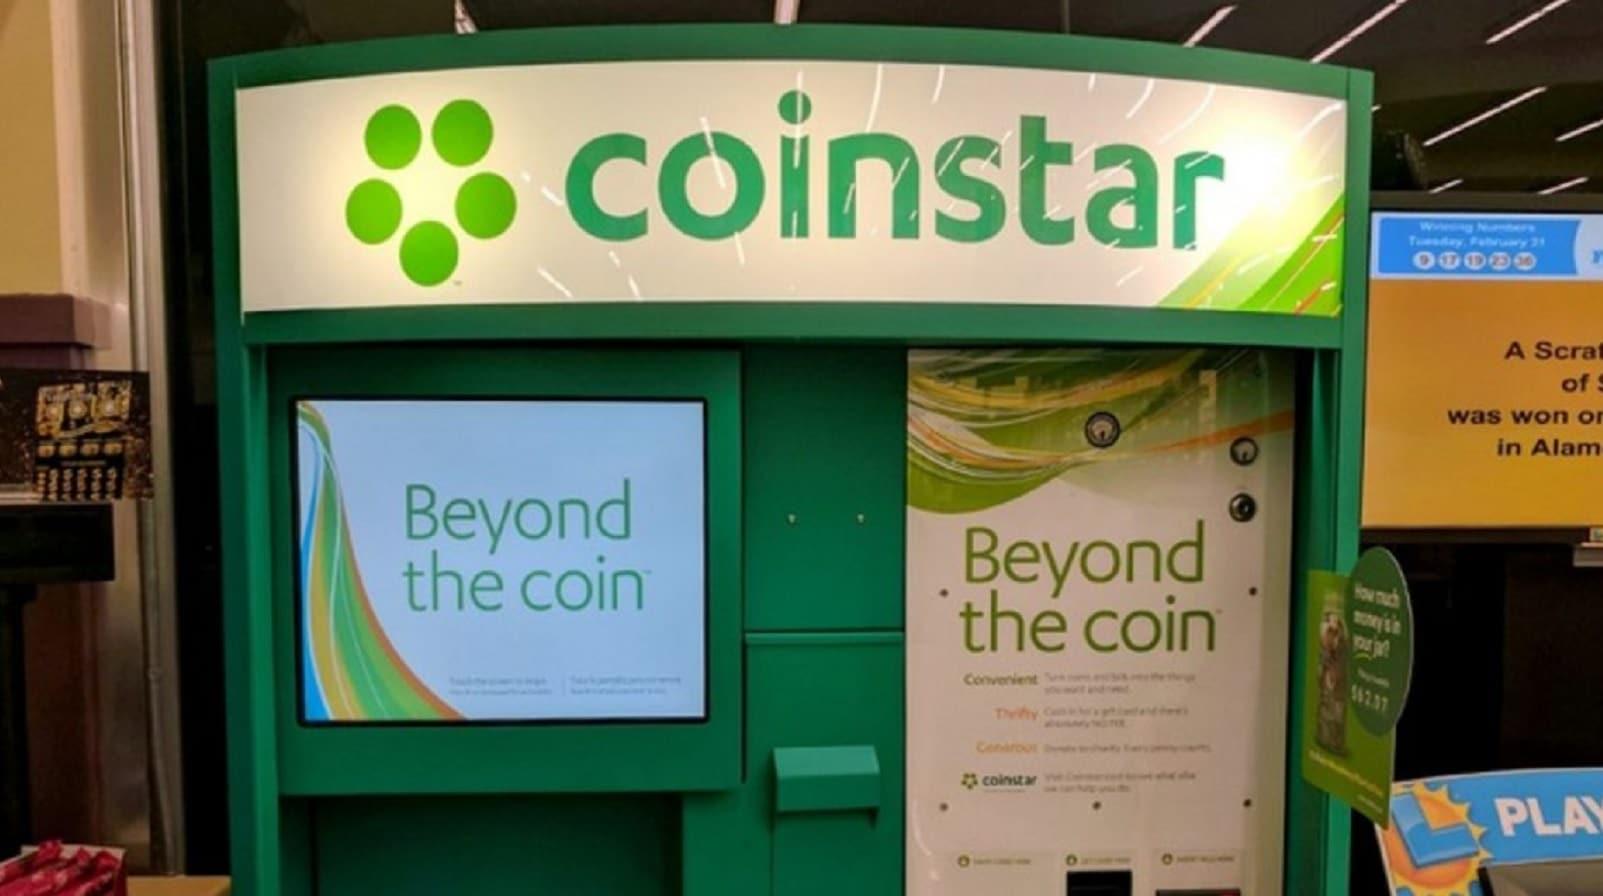 CoinStar